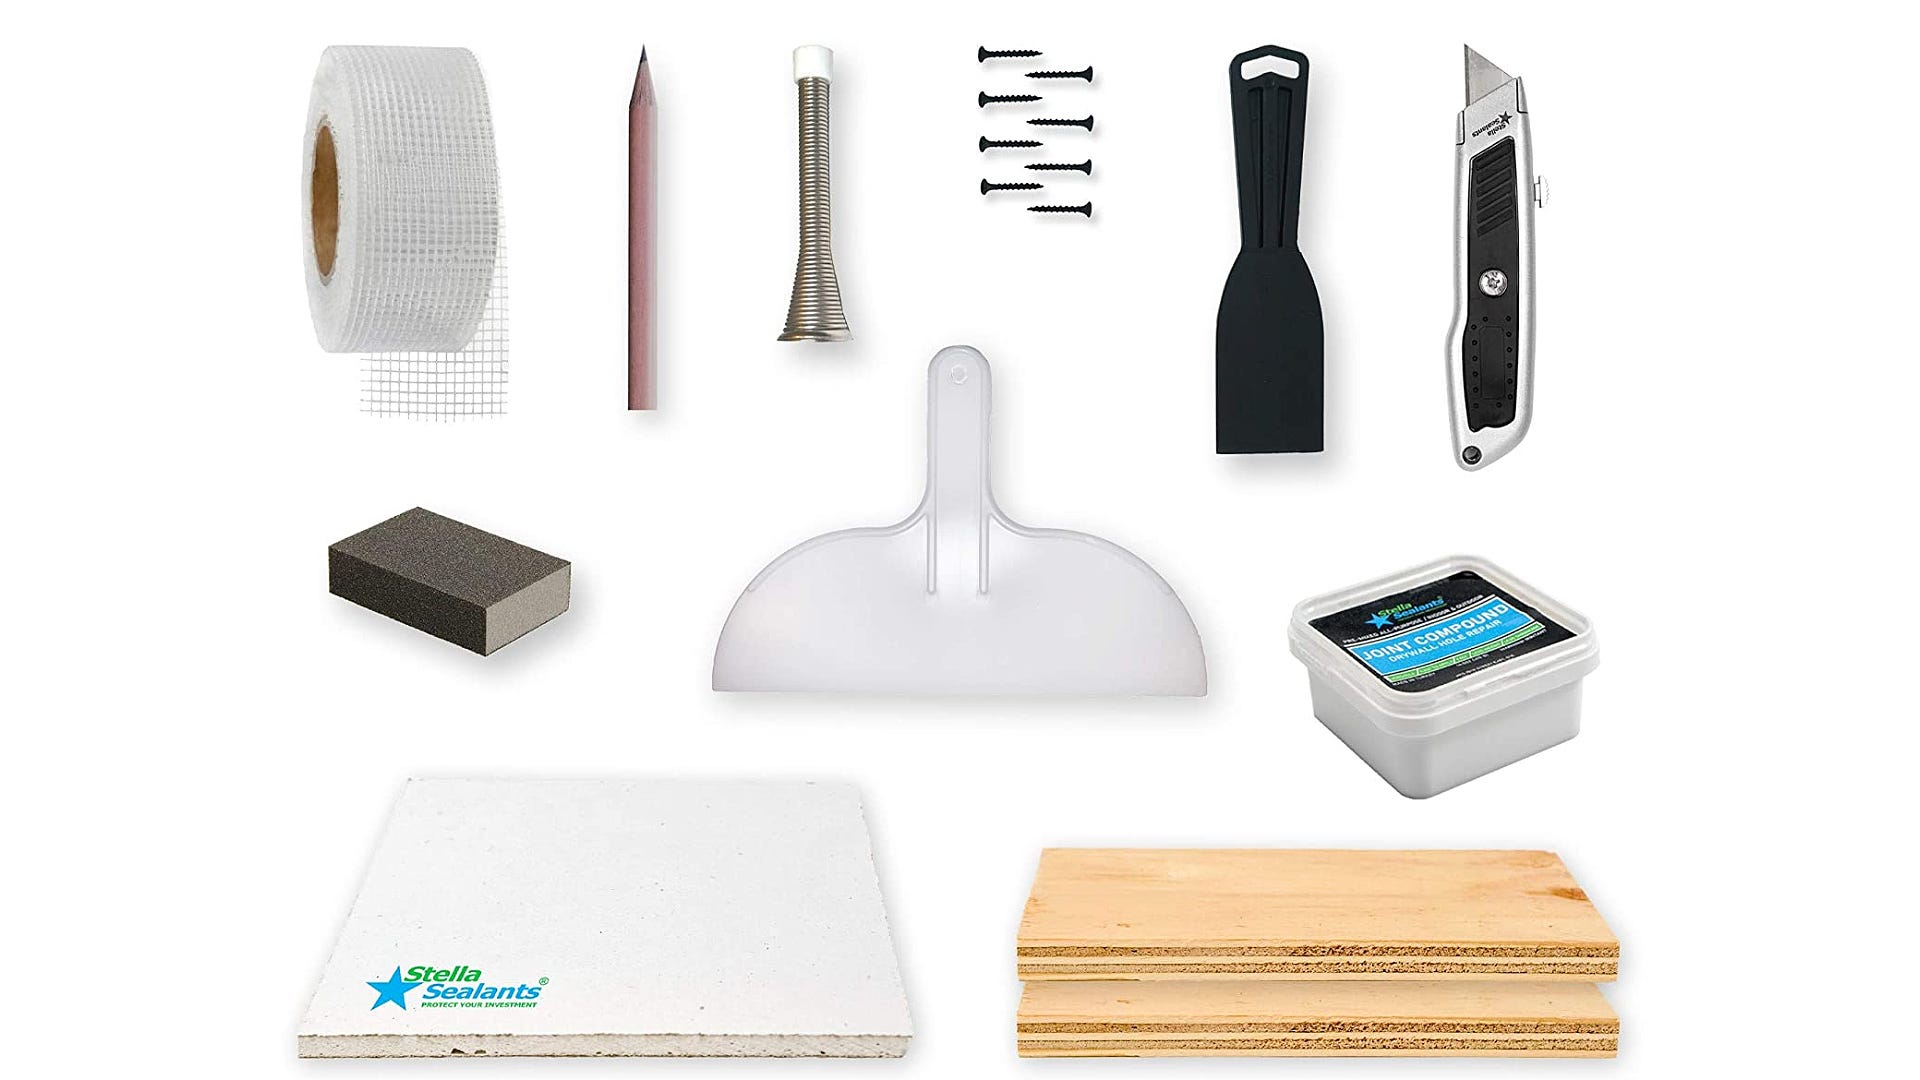 drywall repair kit displayed with multiple tools